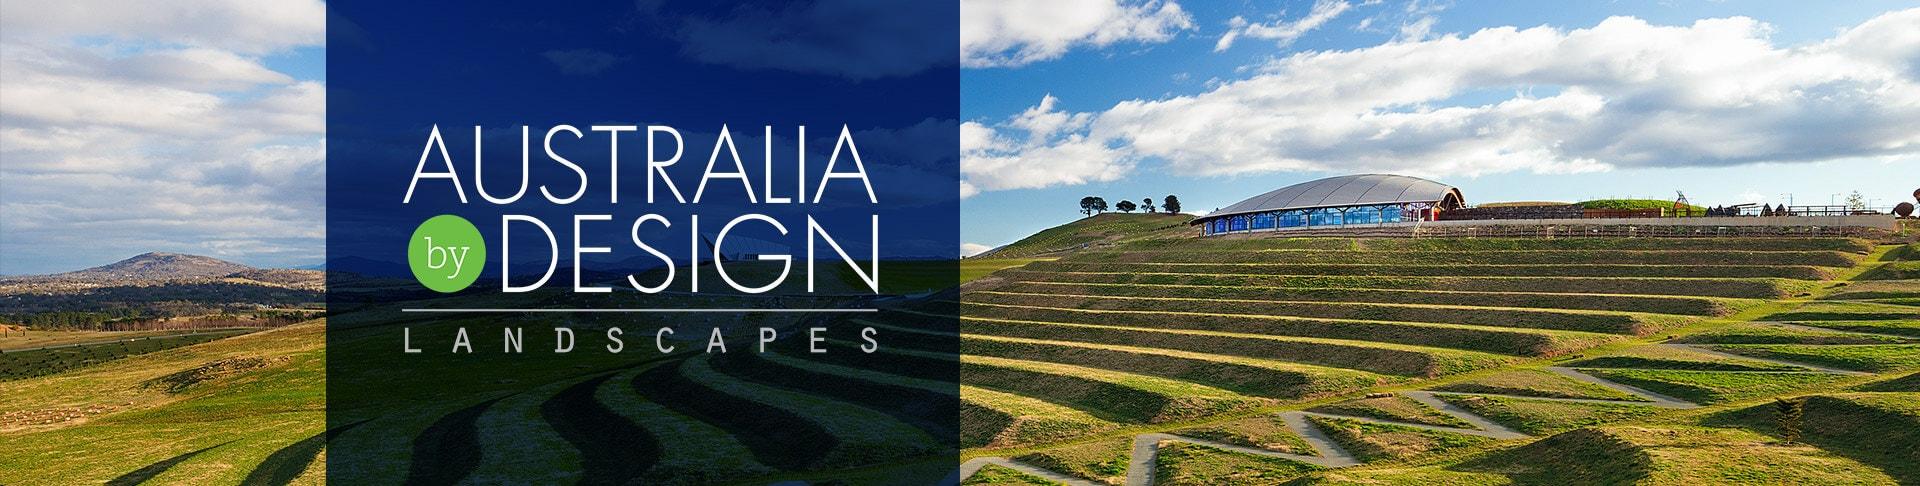 About Australia By Design Landscapes Network Ten